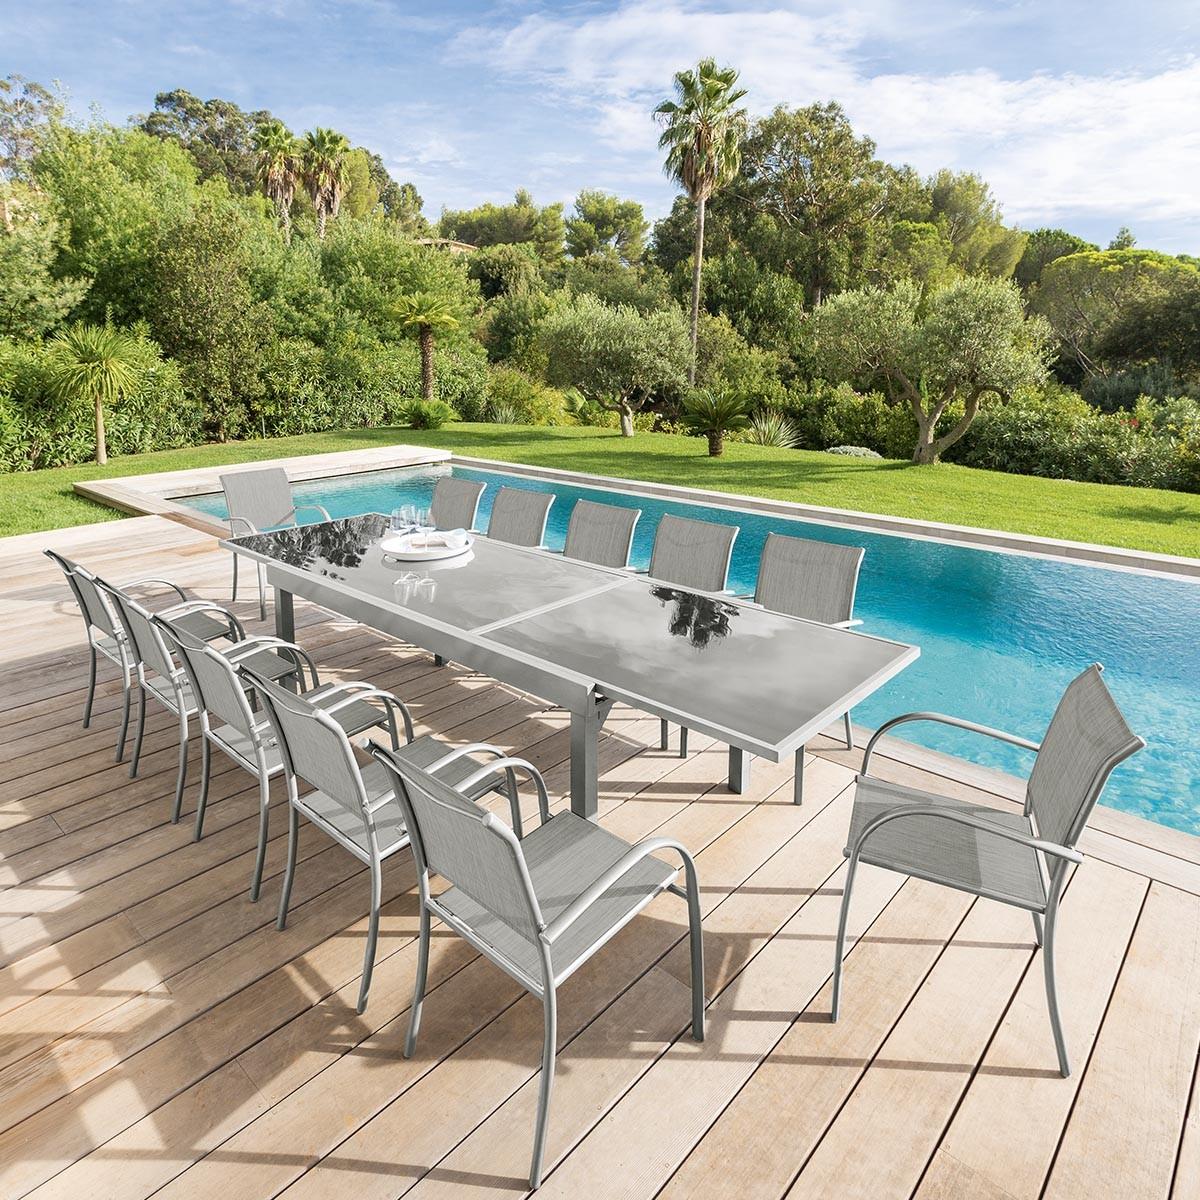 Table de jardin extensible Piazza Gris & Silver mat, Hesperide.com